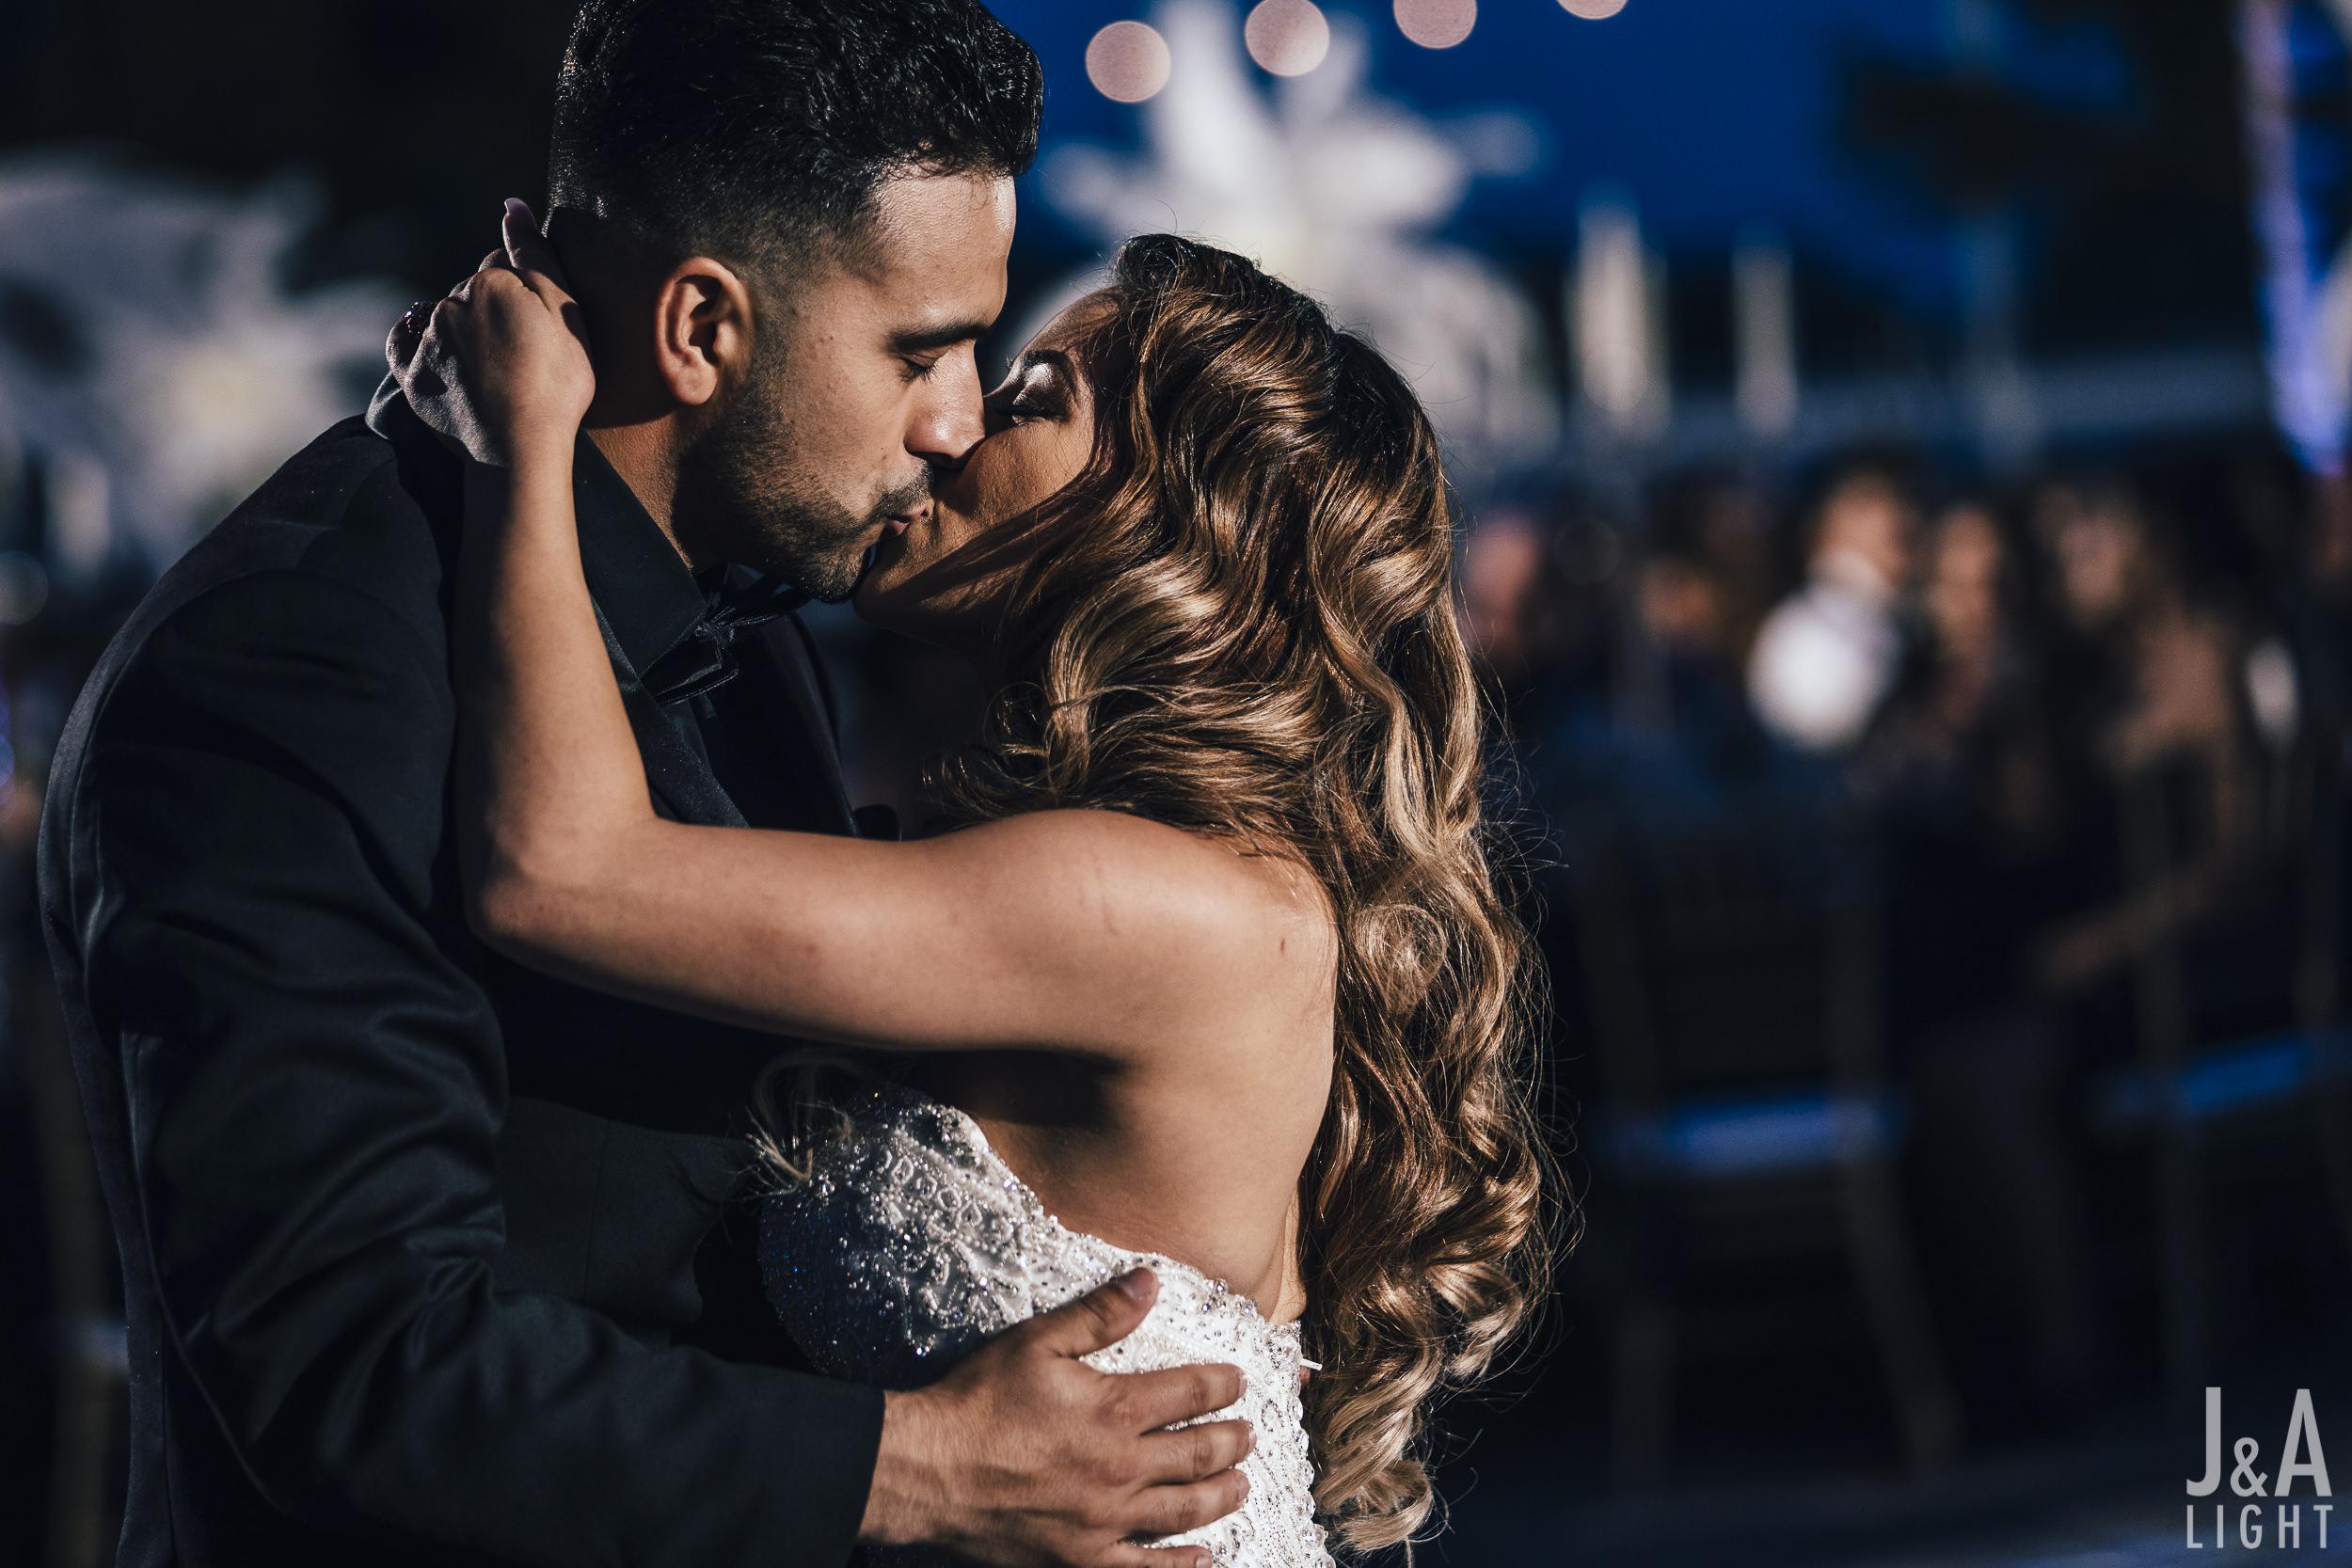 20171014-JanDan-LosBanos-GlassMansion-Wedding-Blog-065.jpg